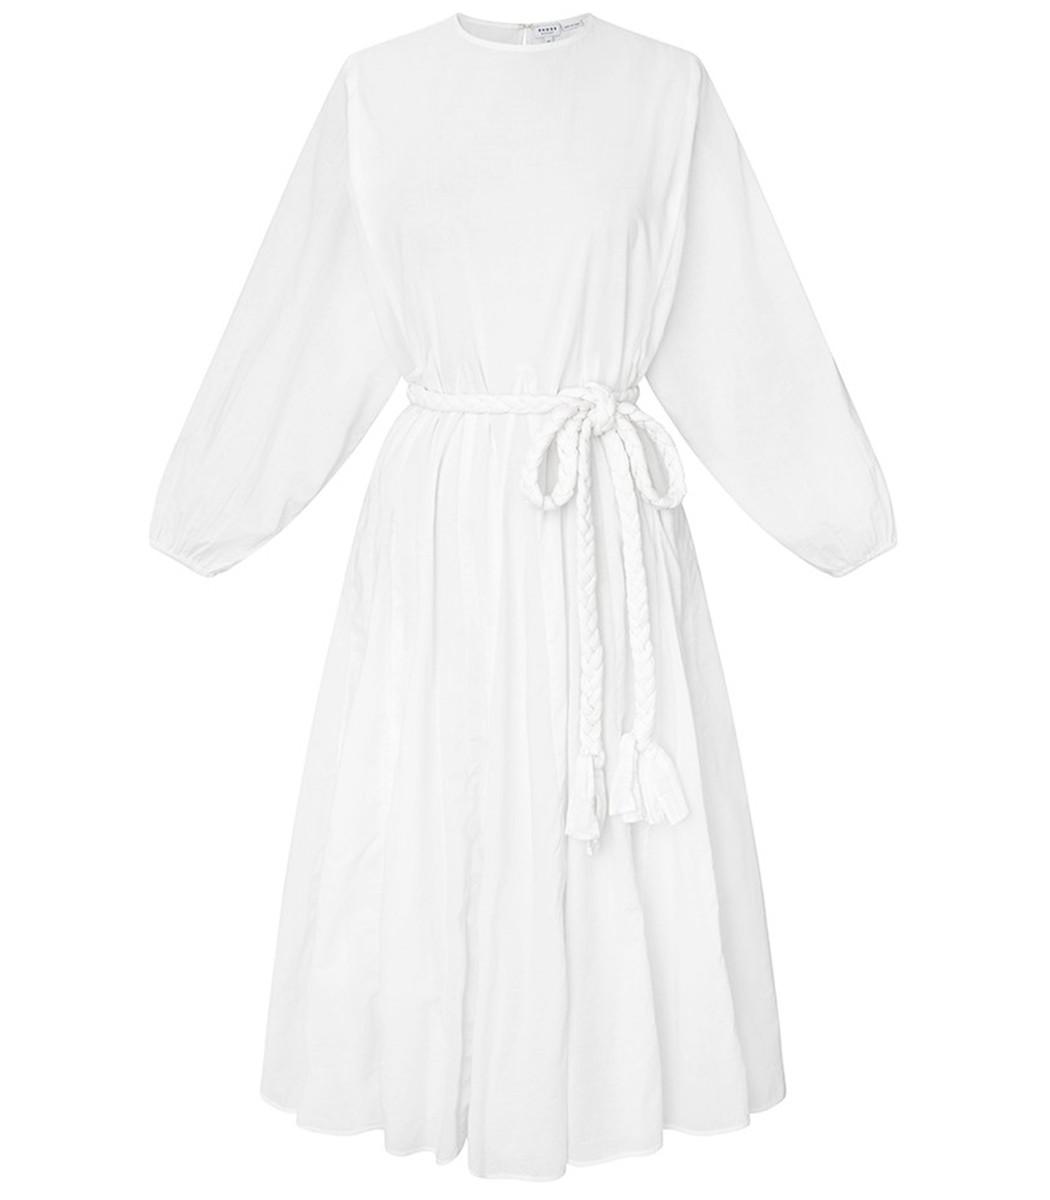 Rhode Devi Dress in White